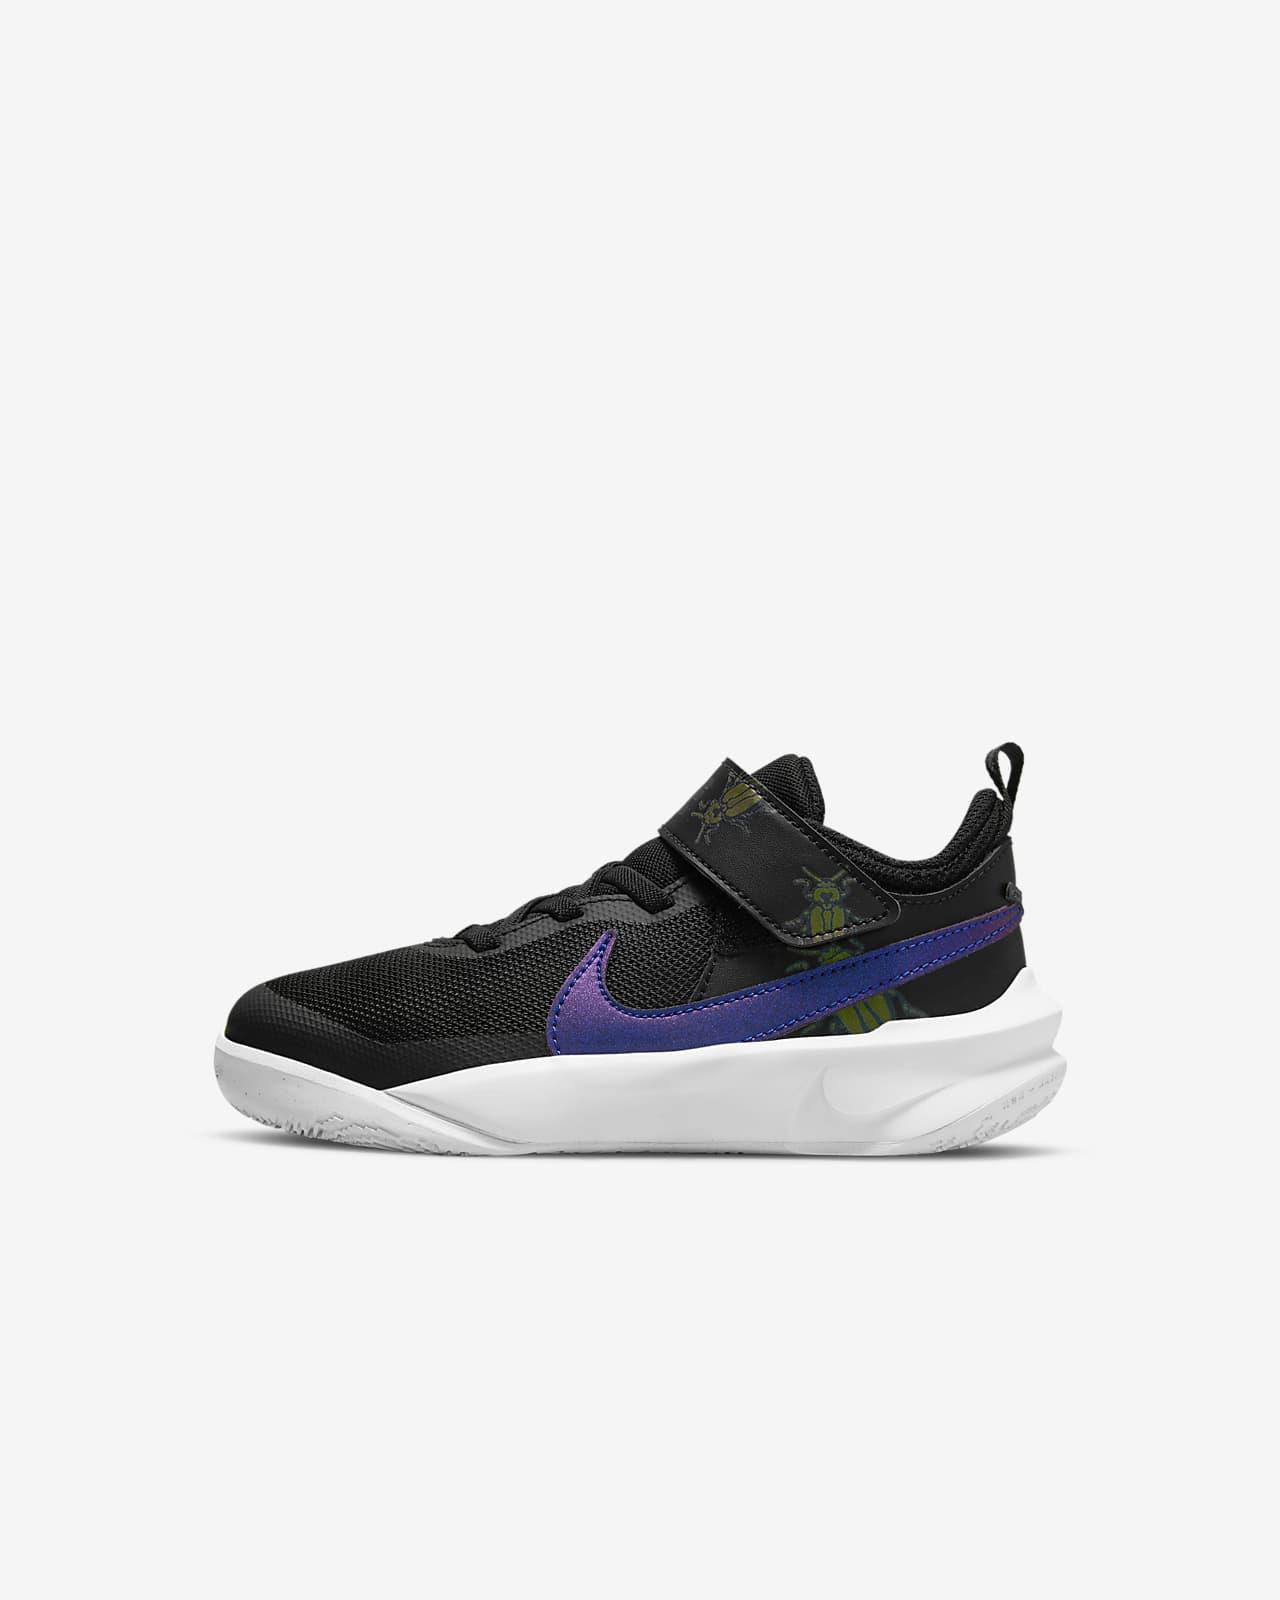 Nike Team Hustle D 10 SE 'Lil Bugs' Younger Kids' Shoe